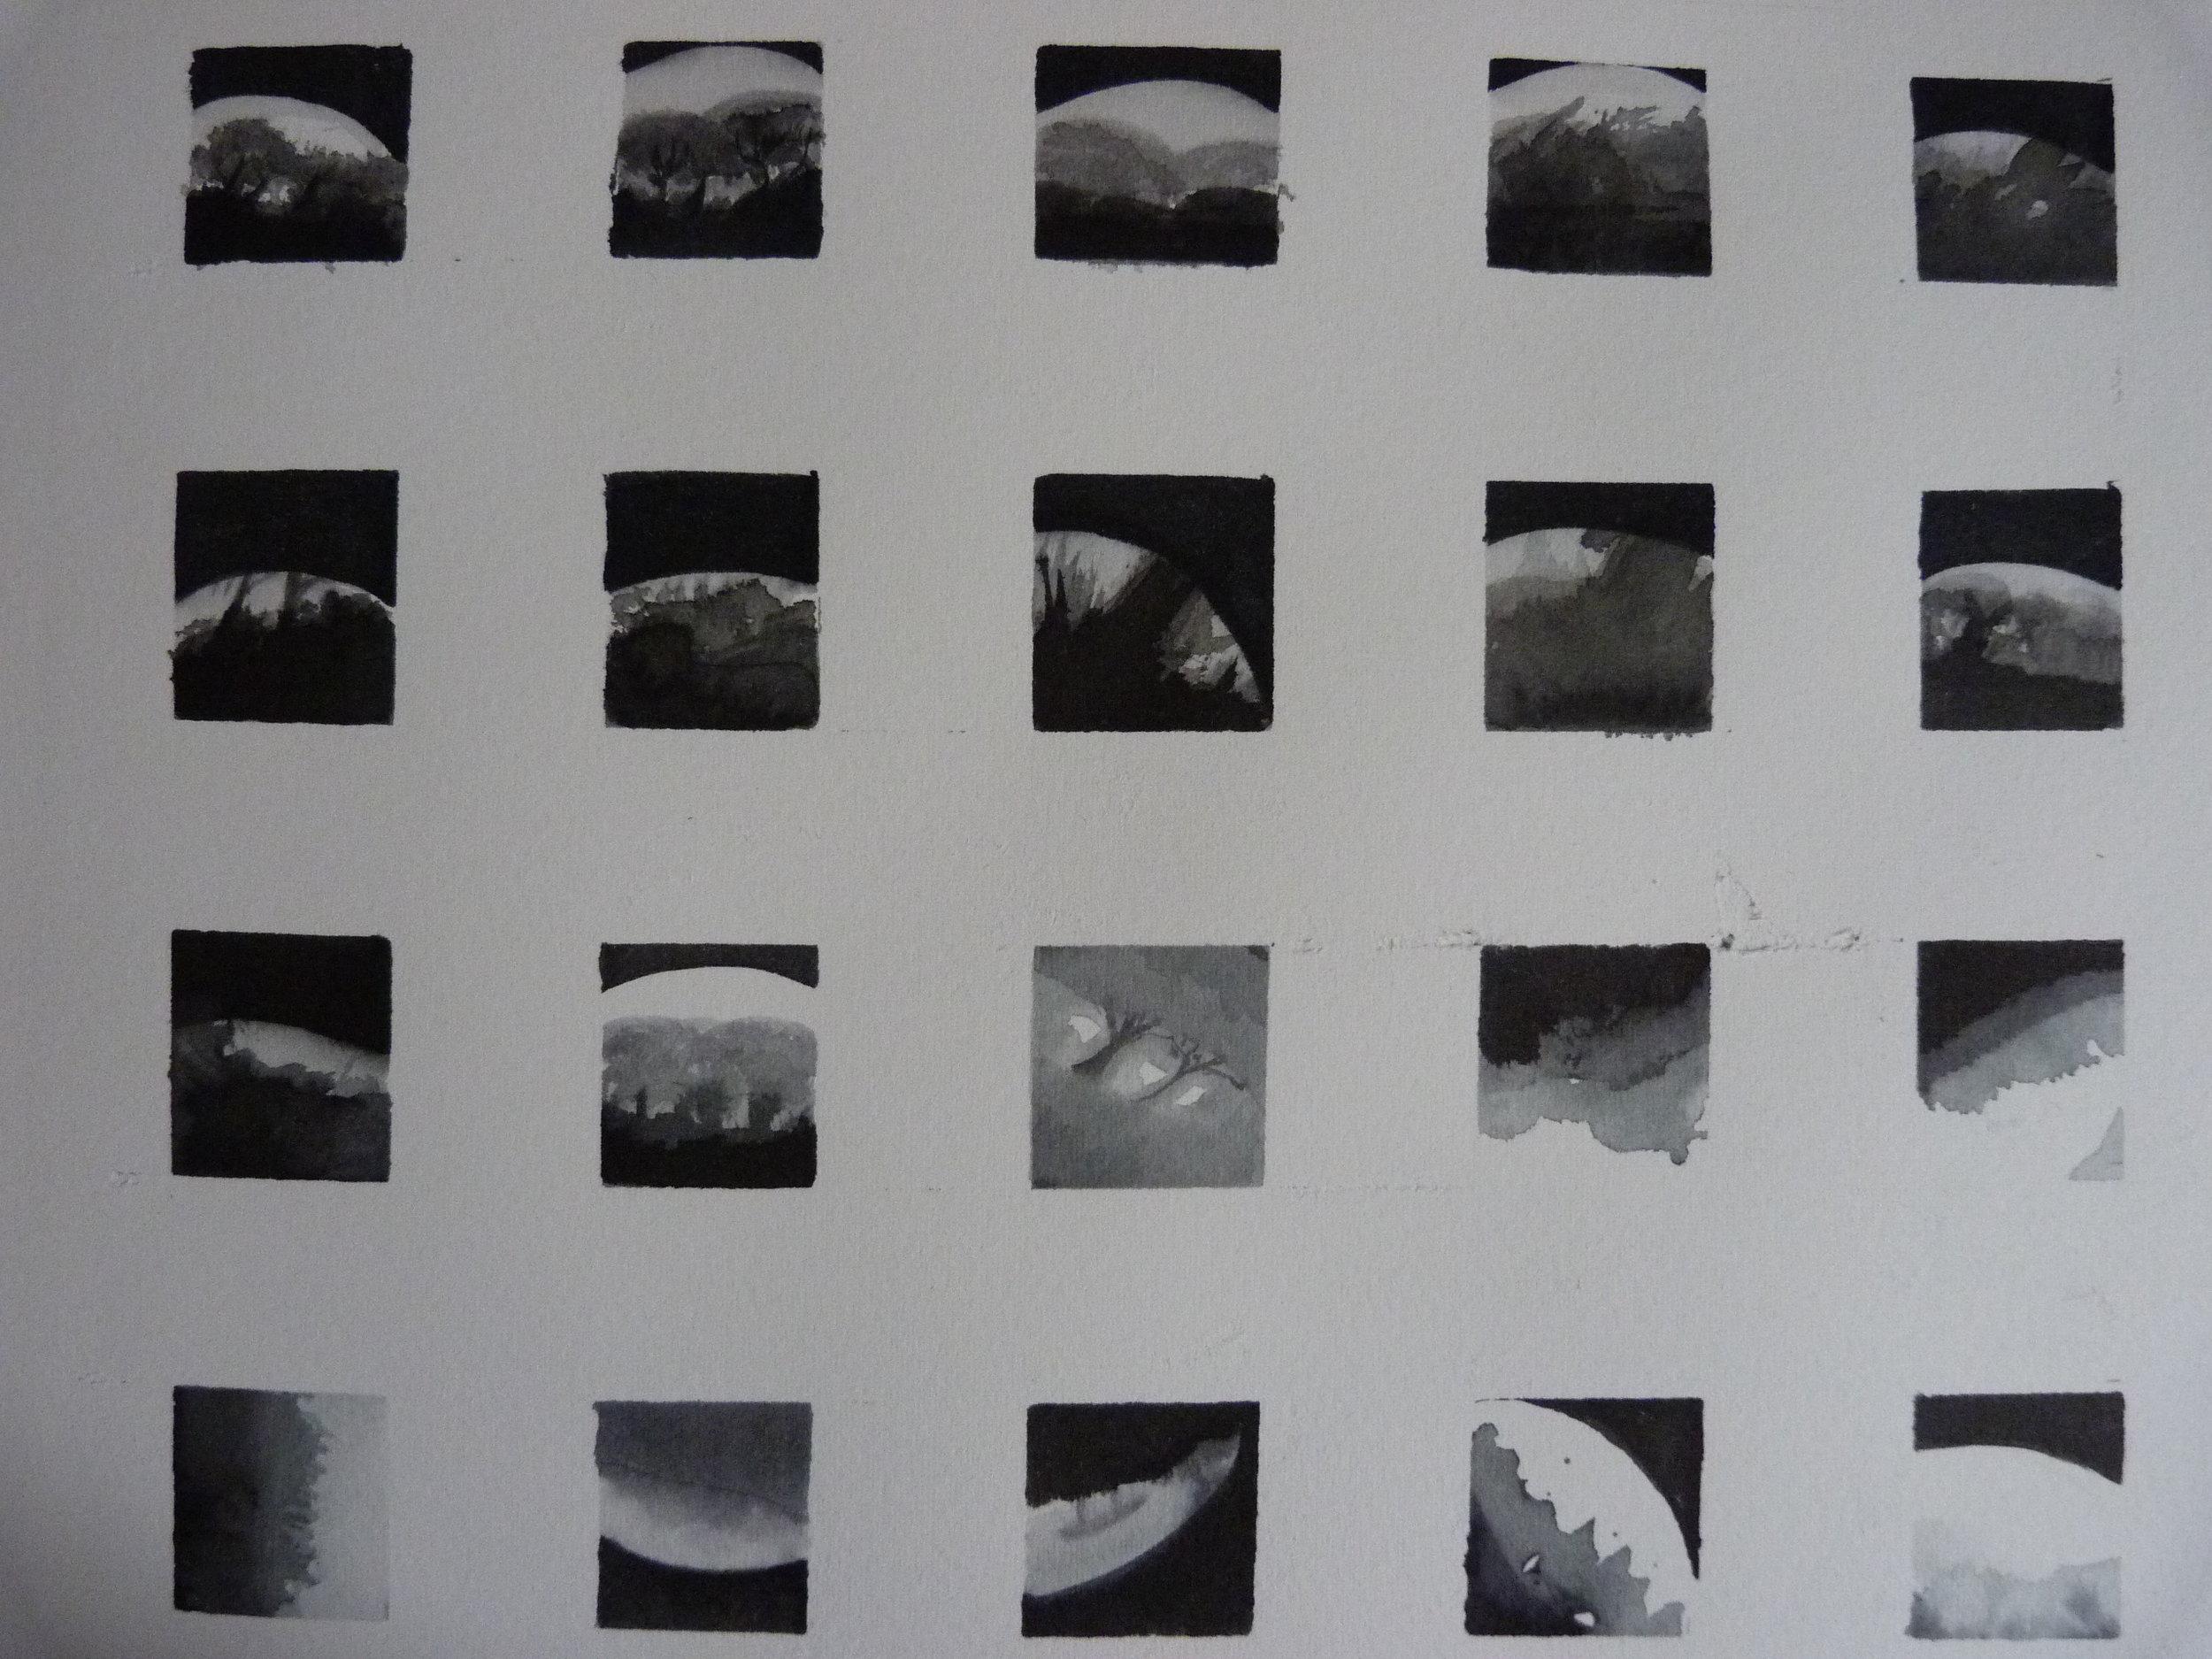 Study for camera obscura